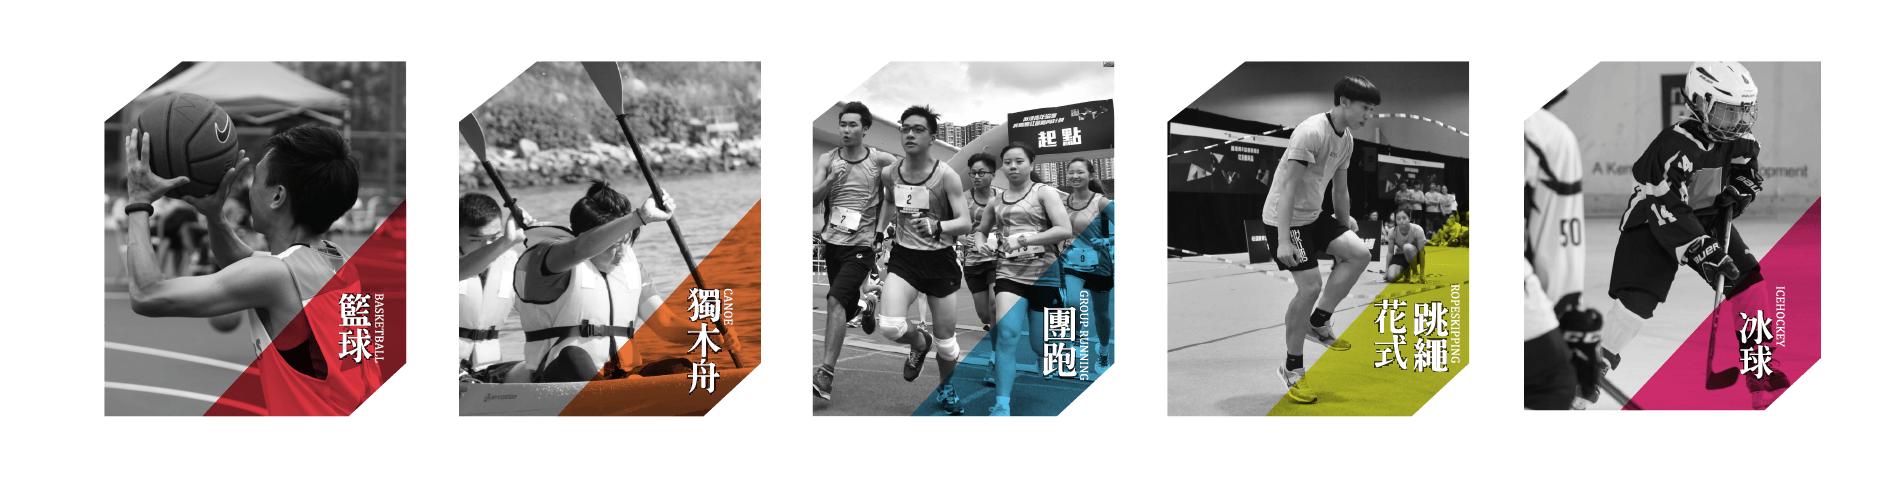 sportsfestforweb-03